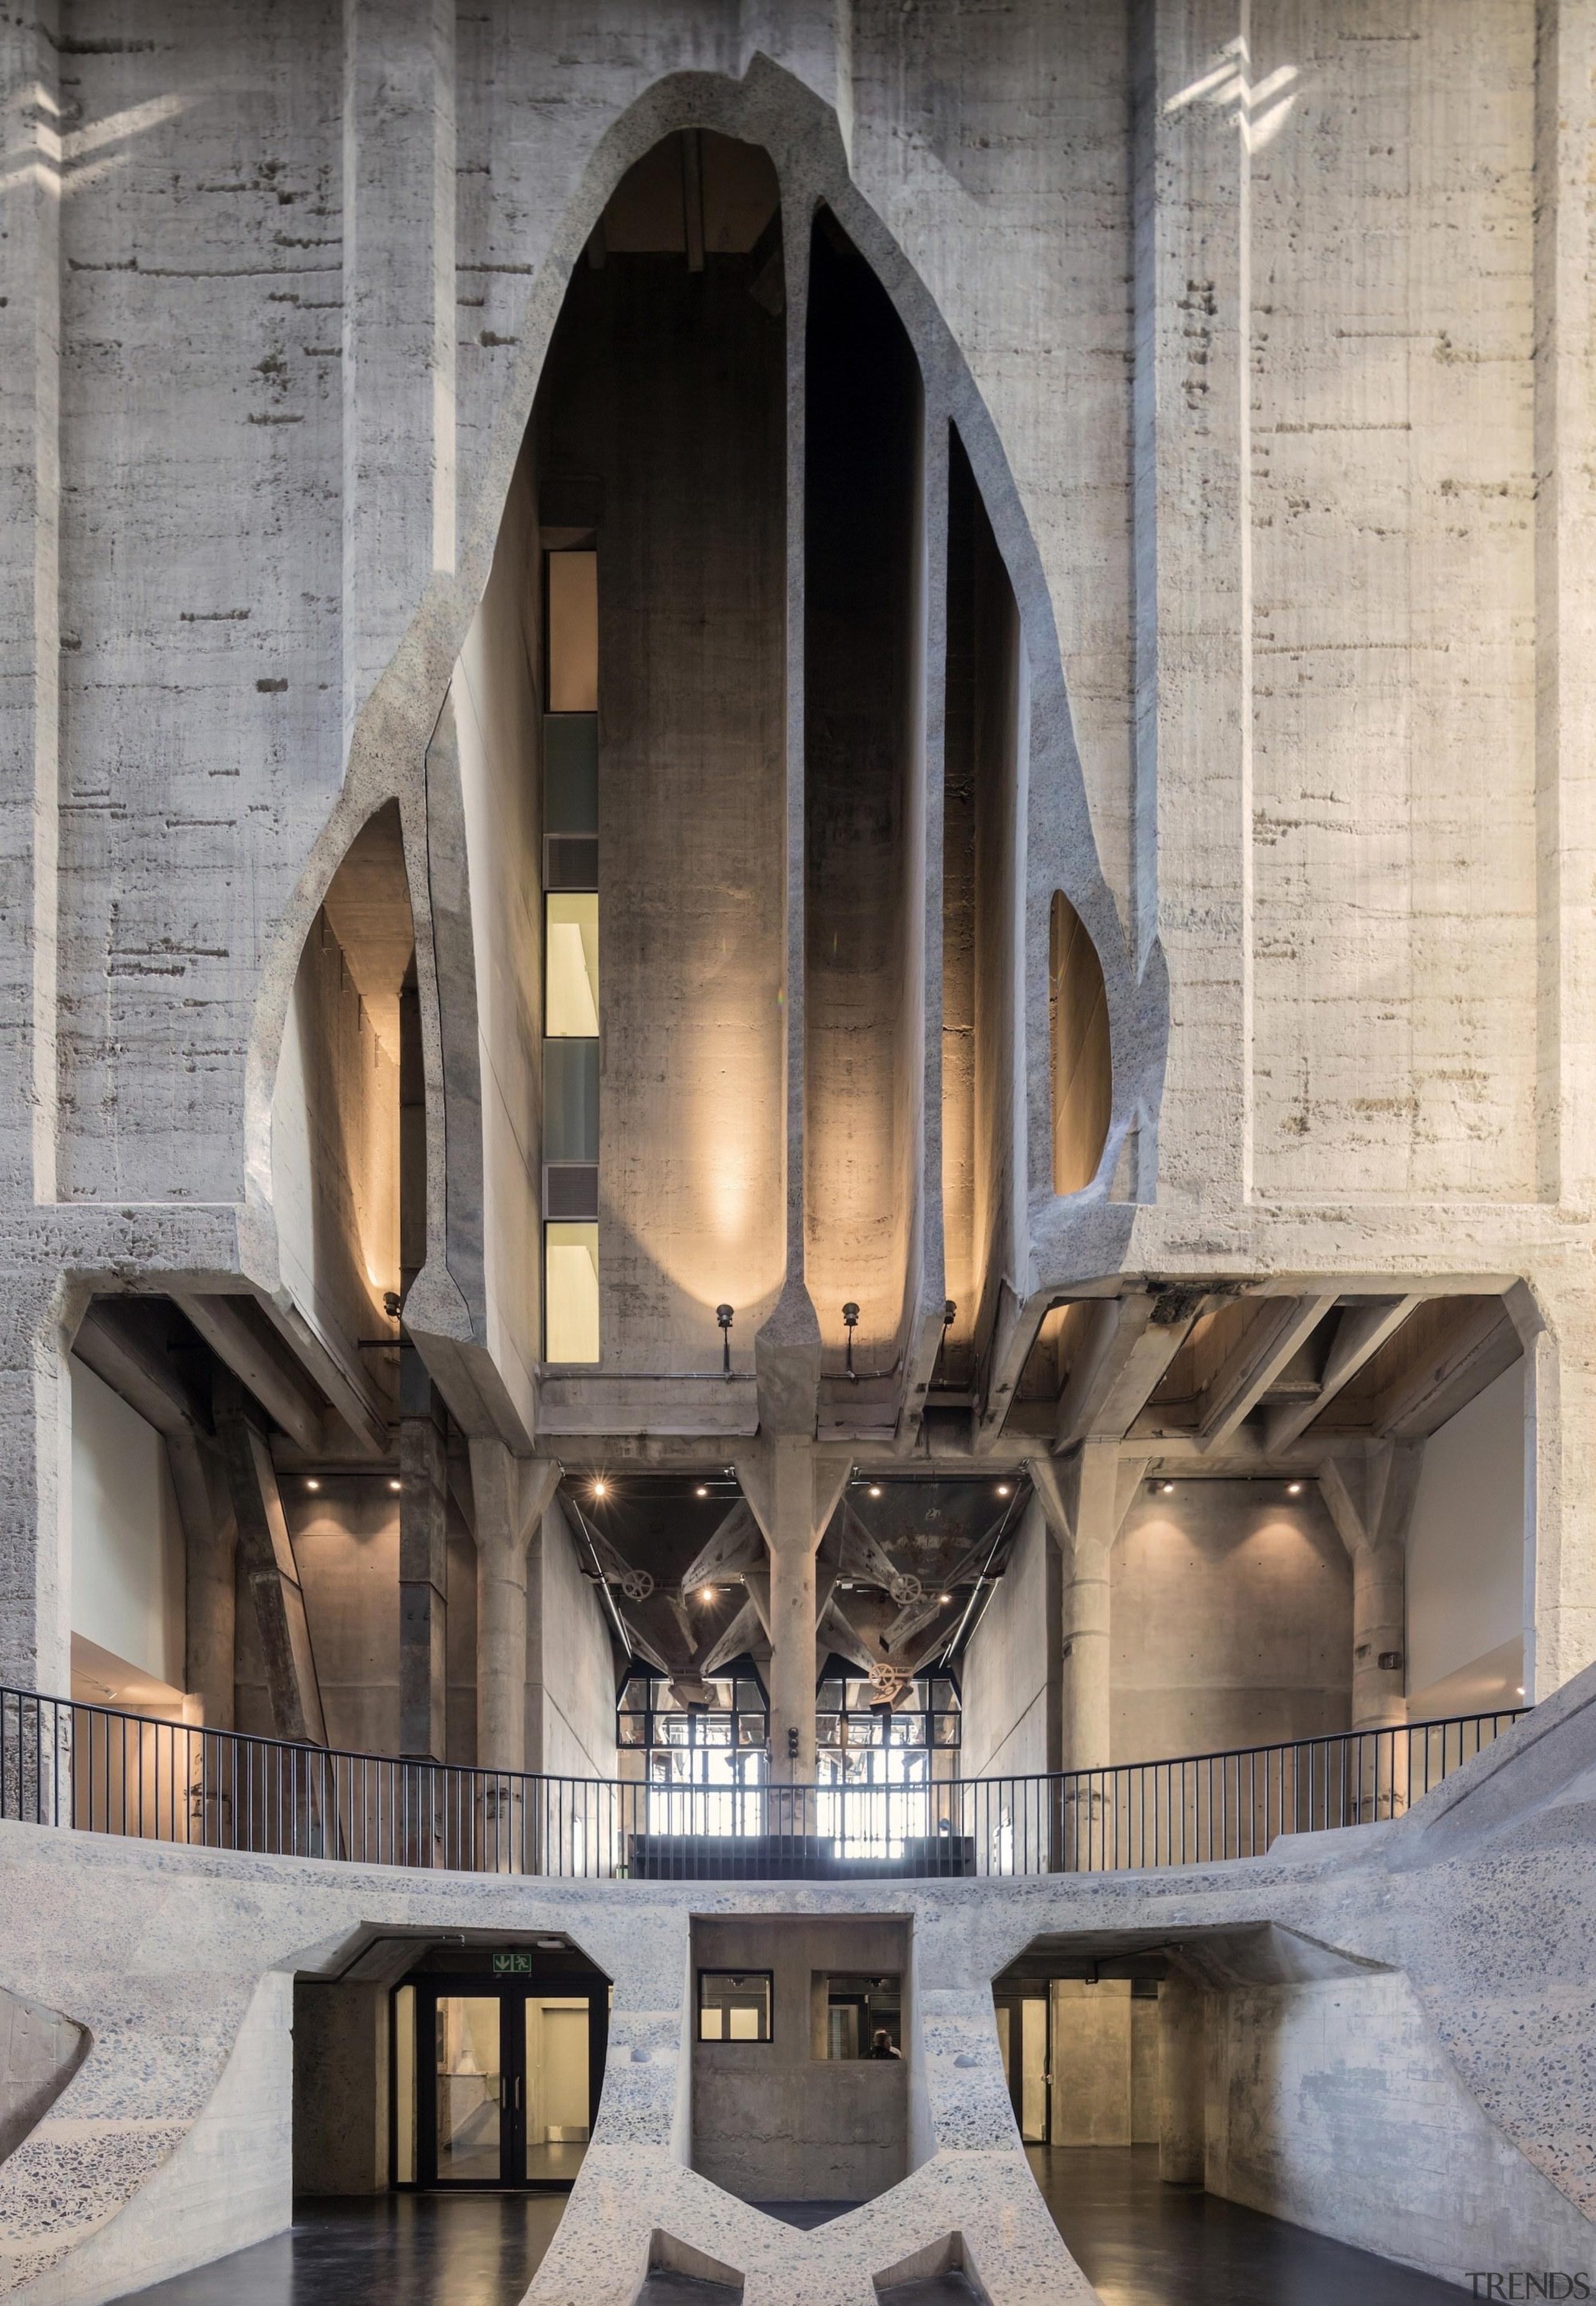 The Zeitz Museum of Contemporary Art Africa (Zeitz arch, architecture, building, gray